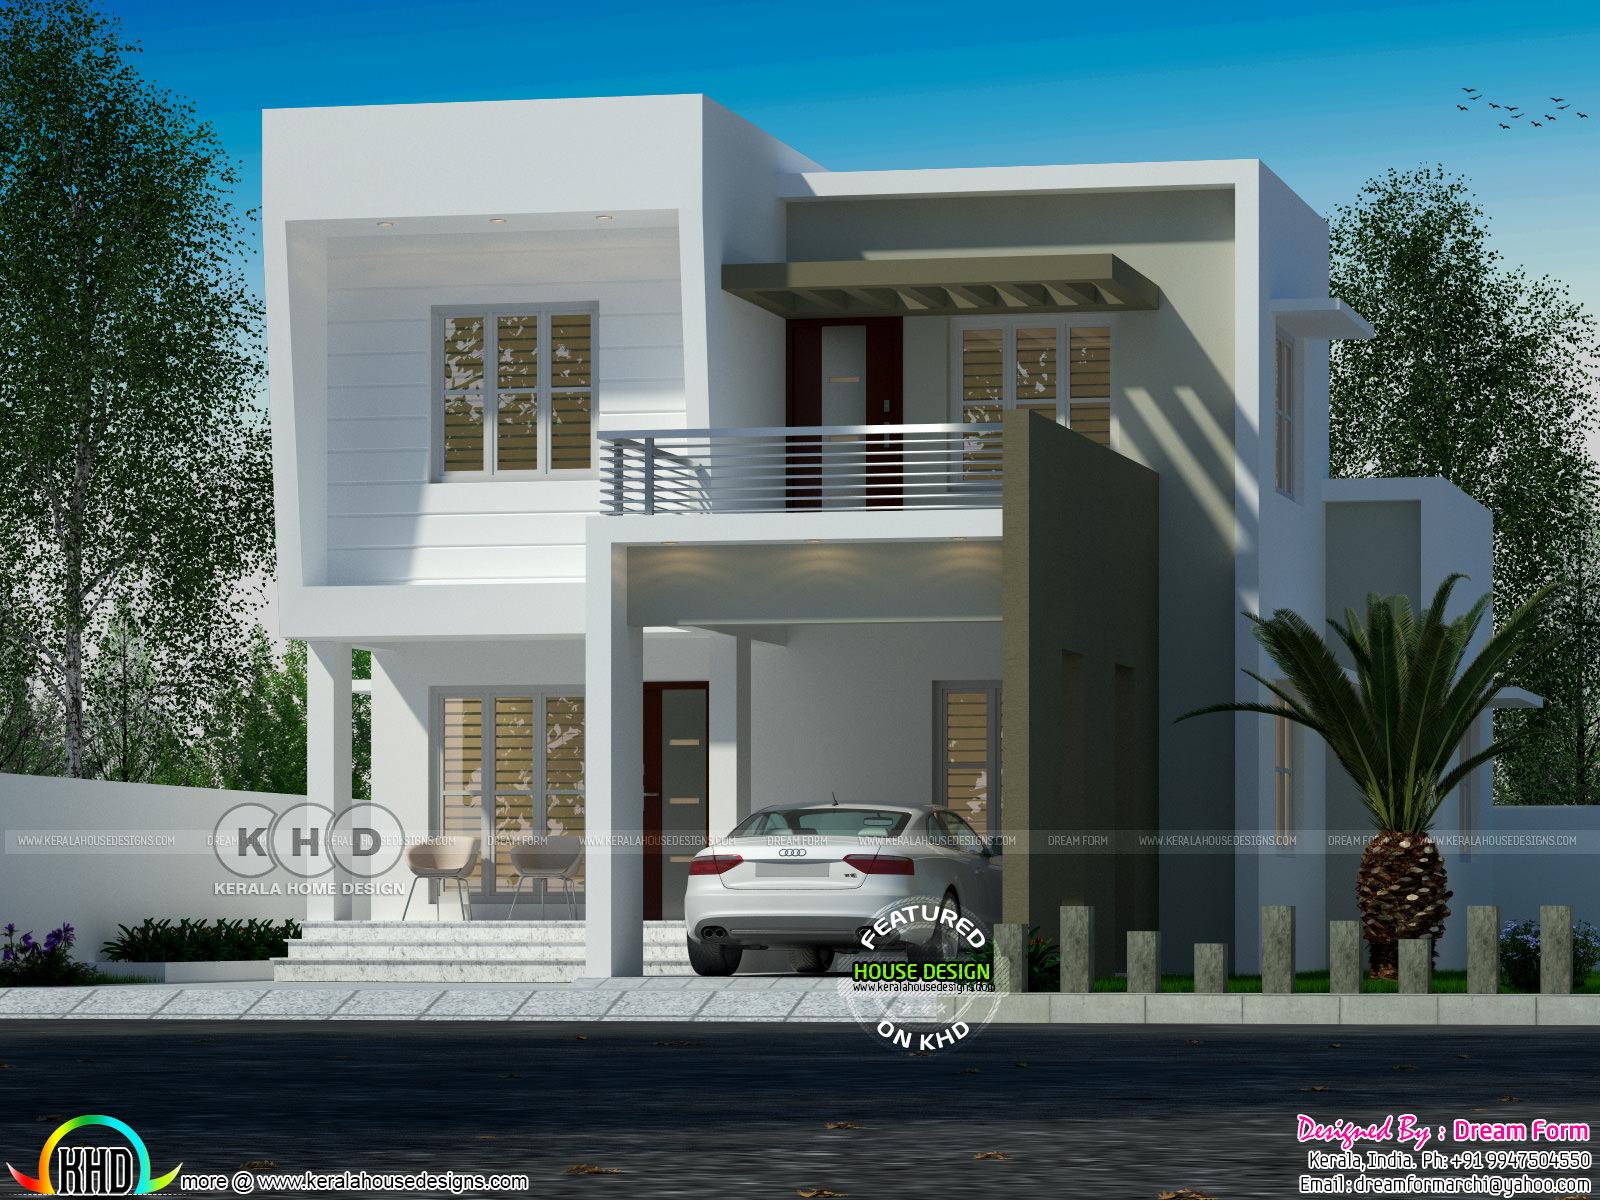 1528 Square Feet 3 Bedroom Flat Roof Home Kerala Home